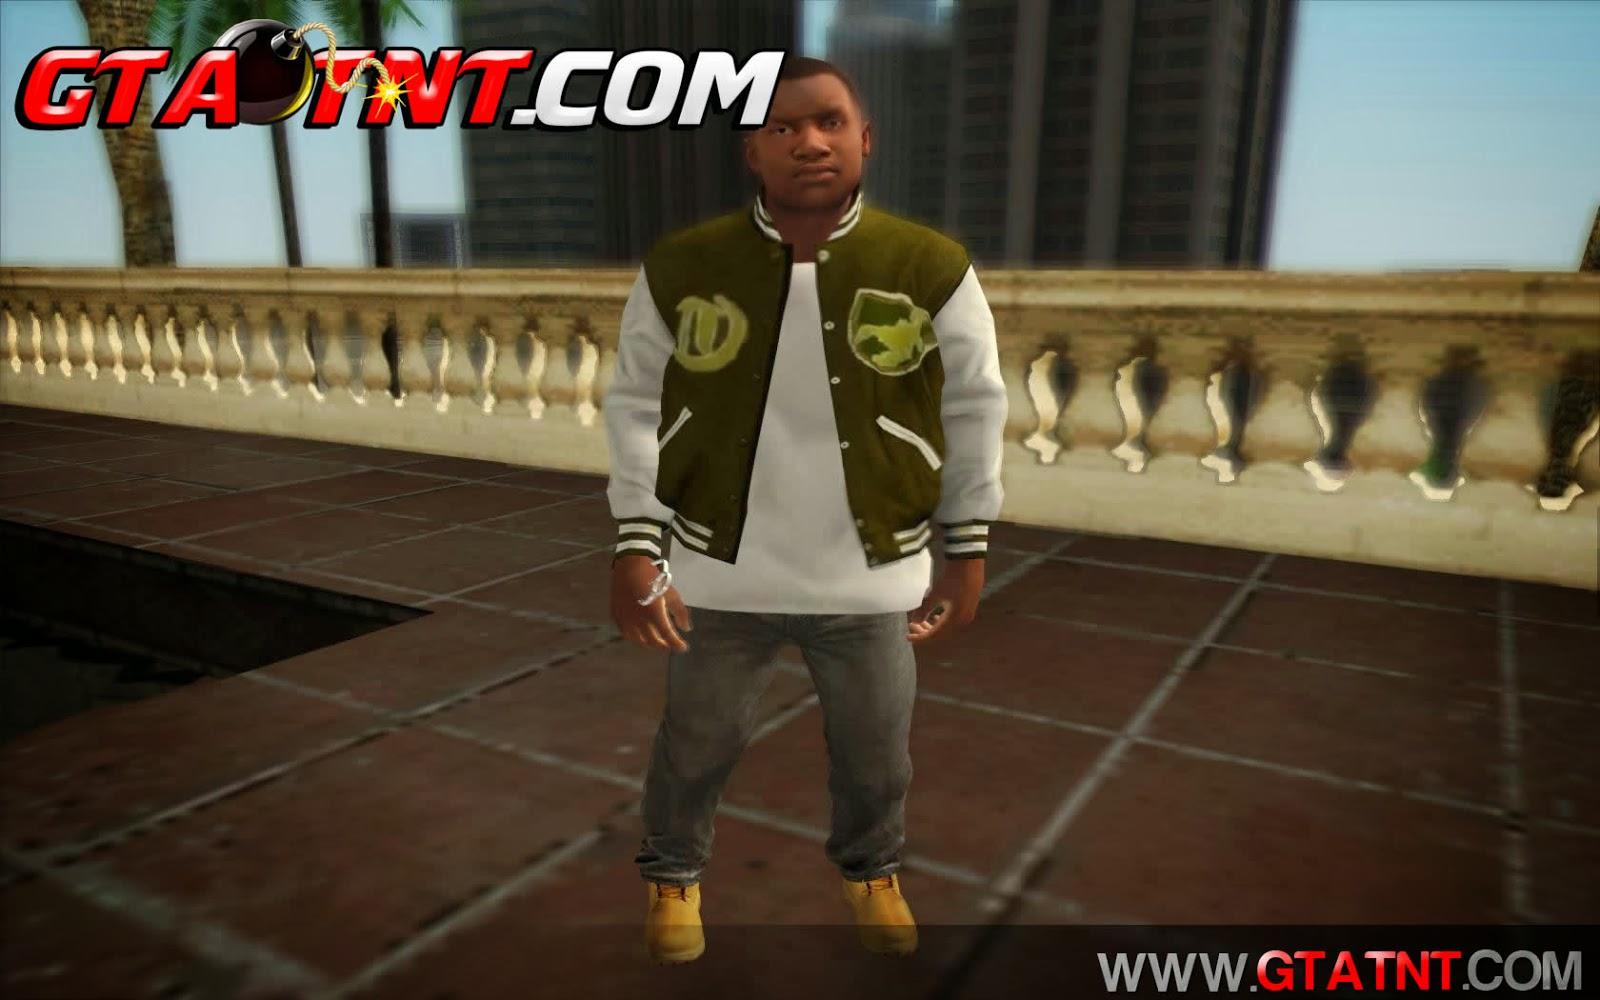 GTA SA - Skins Franklin do GTA 5